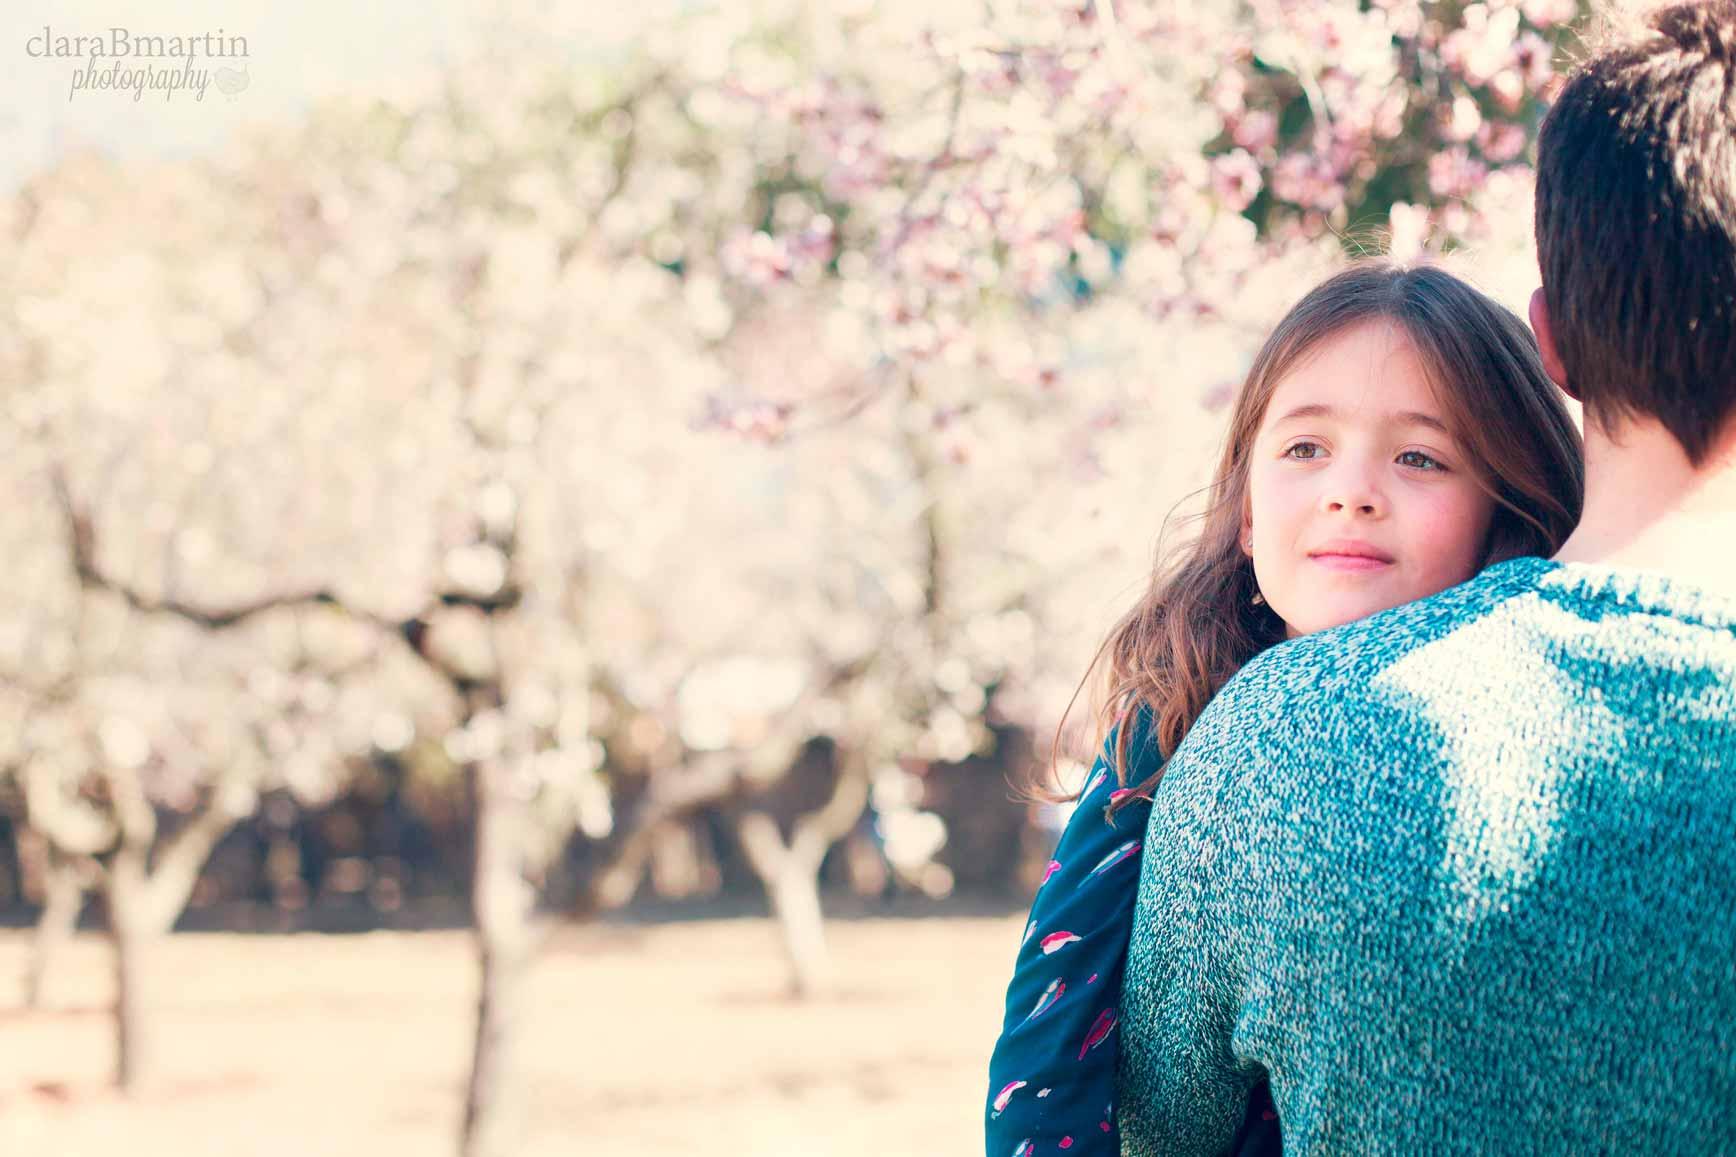 Primavera_claraBmartin02